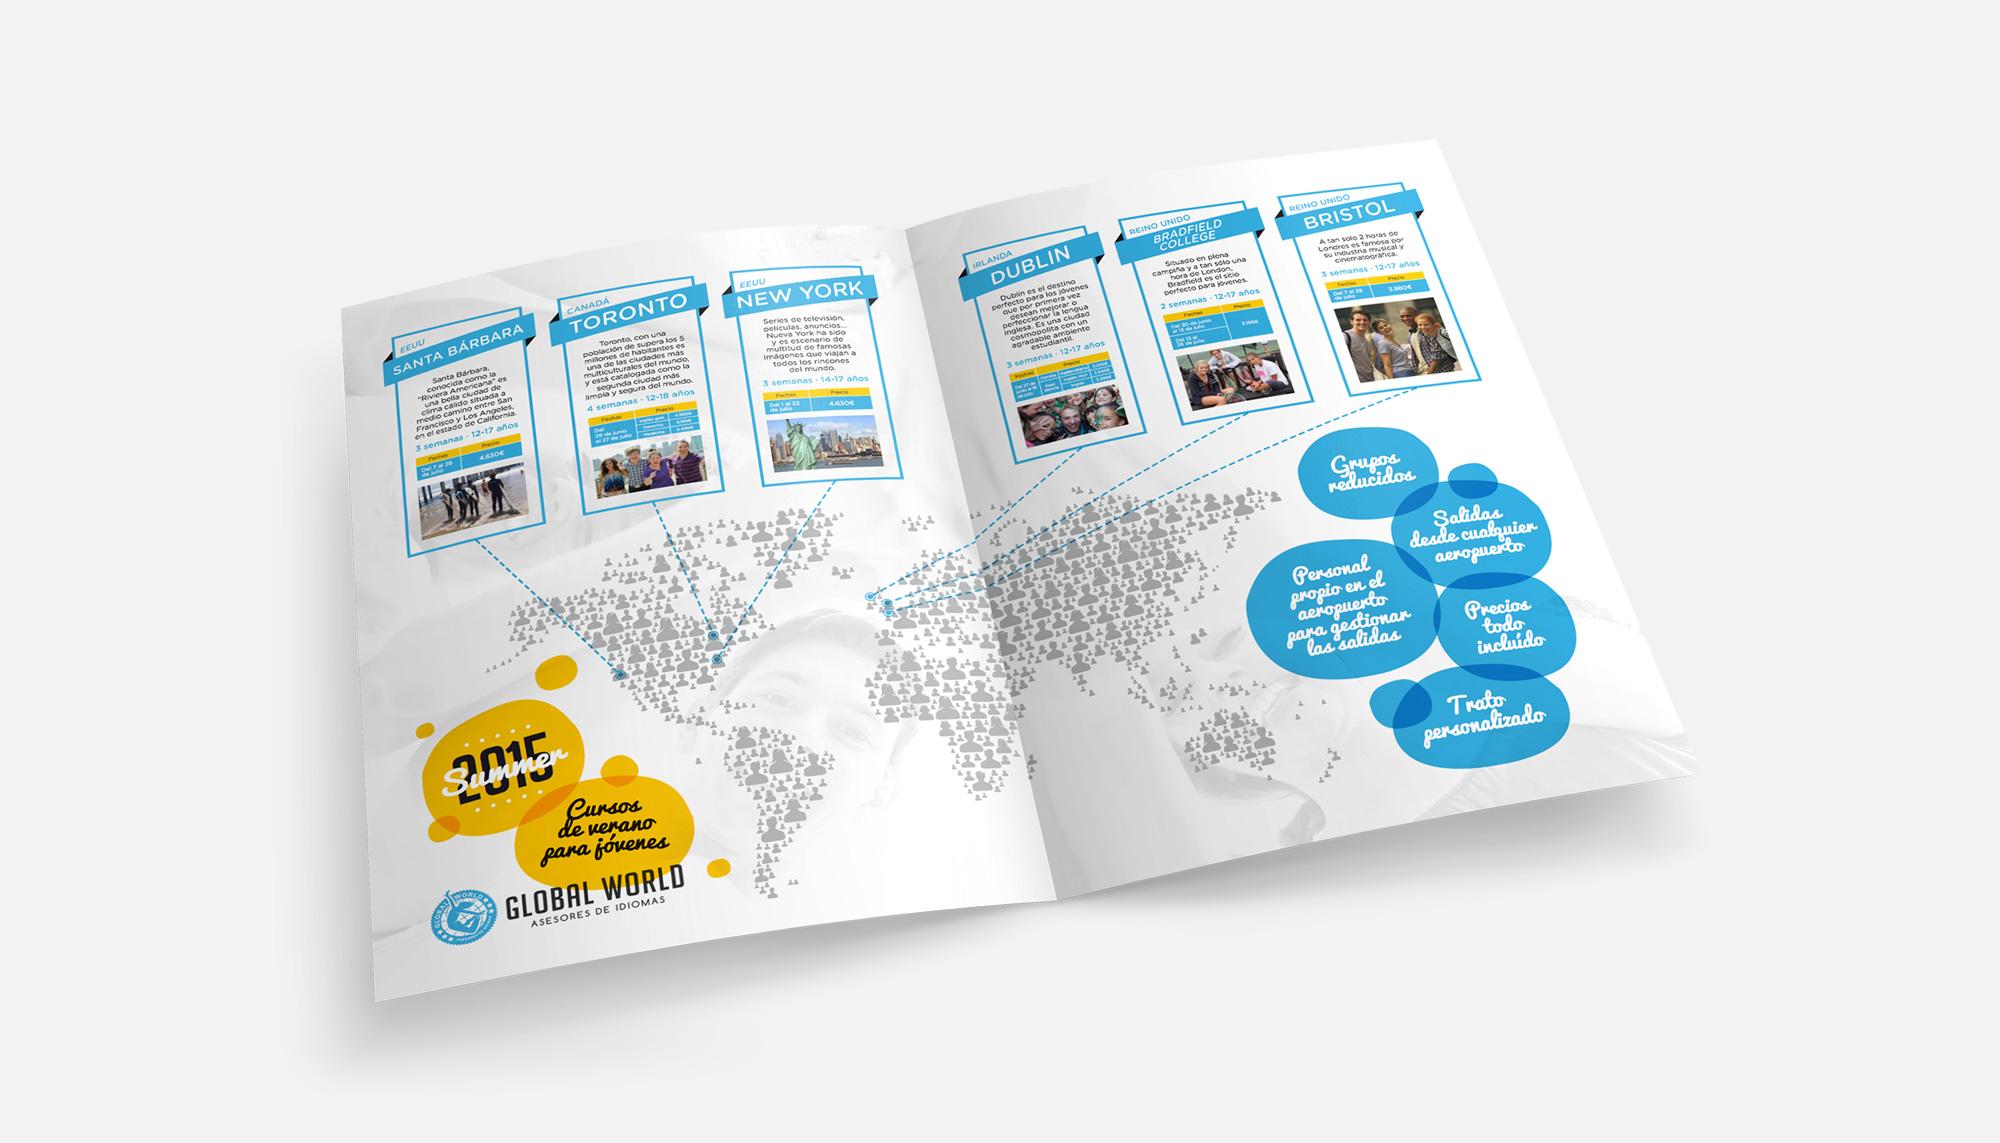 Publicidad Global World